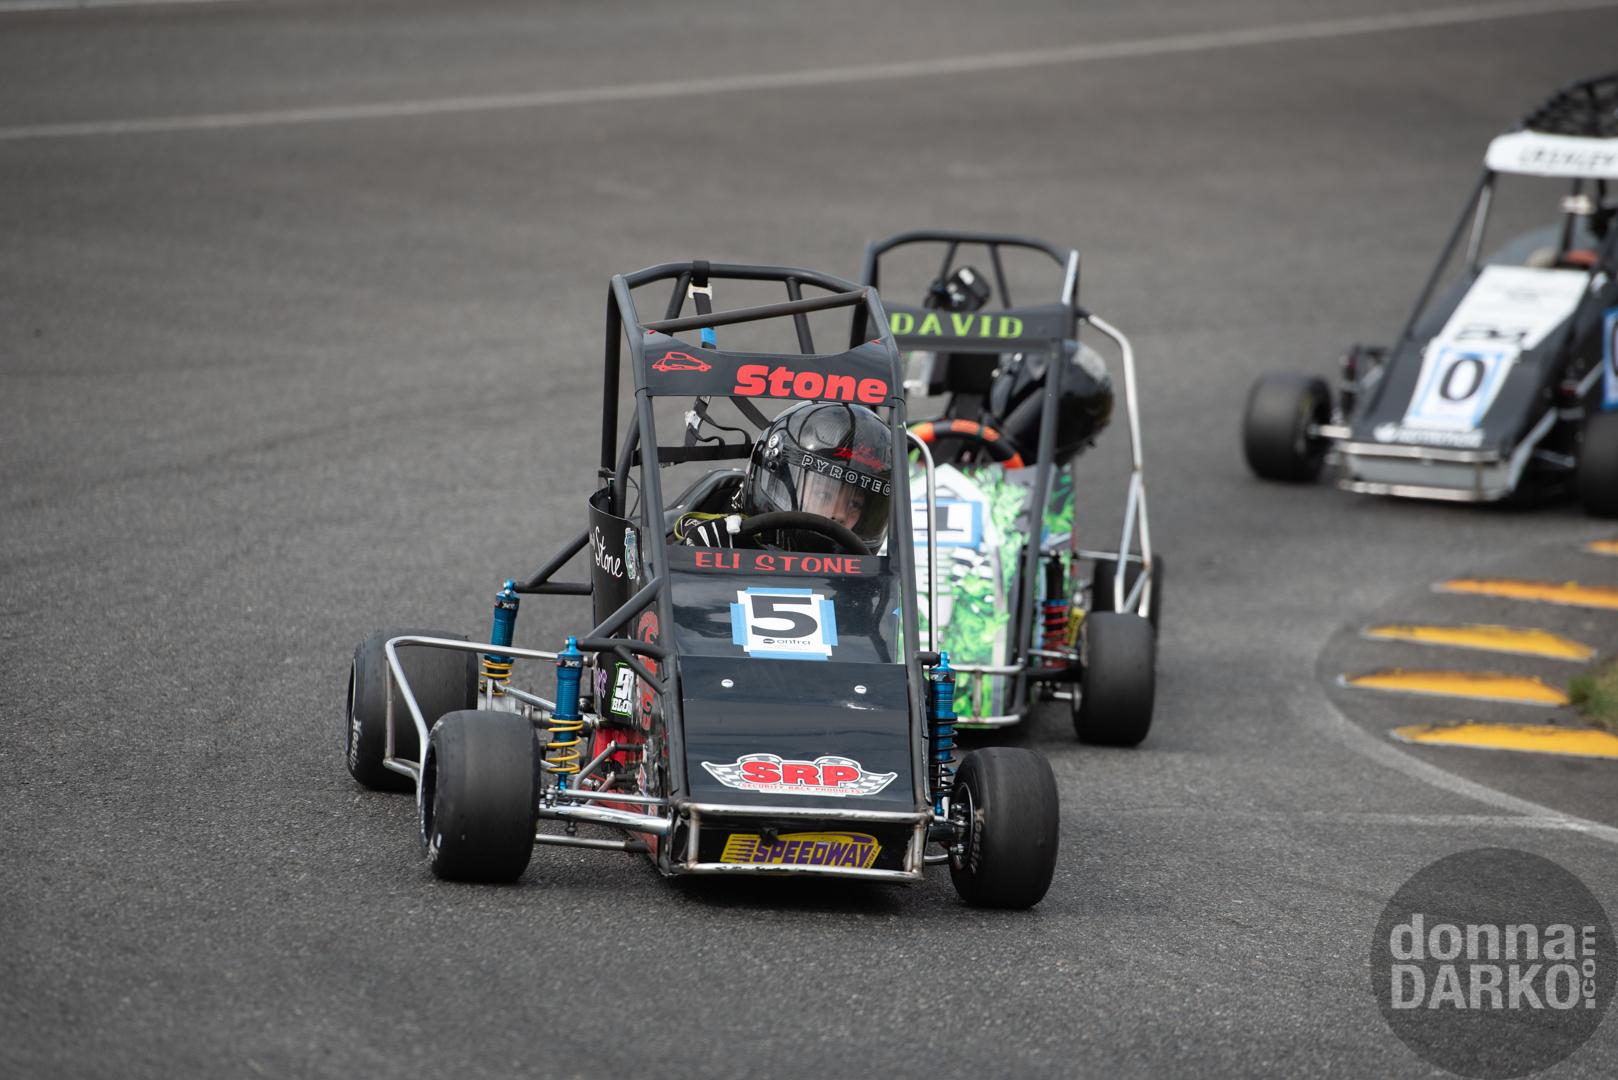 QWMA (Racing) 8-11-2019 DSC_7657.jpg